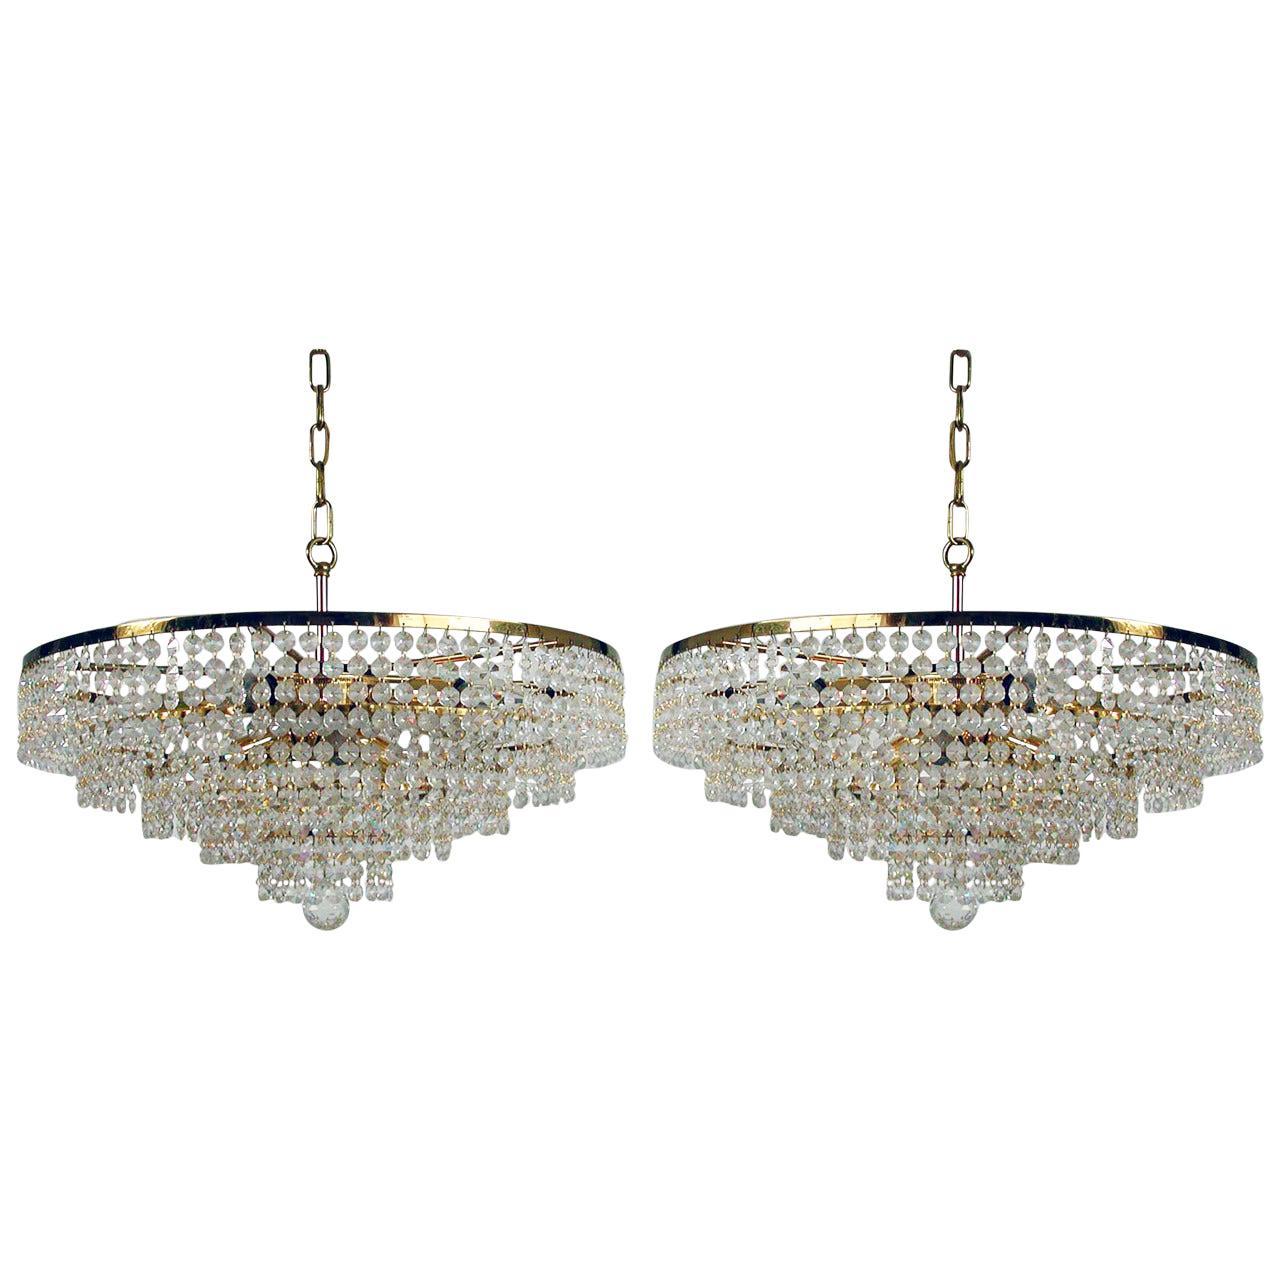 Midcentury 1960s Five-Tier Eight-Light Ernst Palme Crystal Glass Chandelier